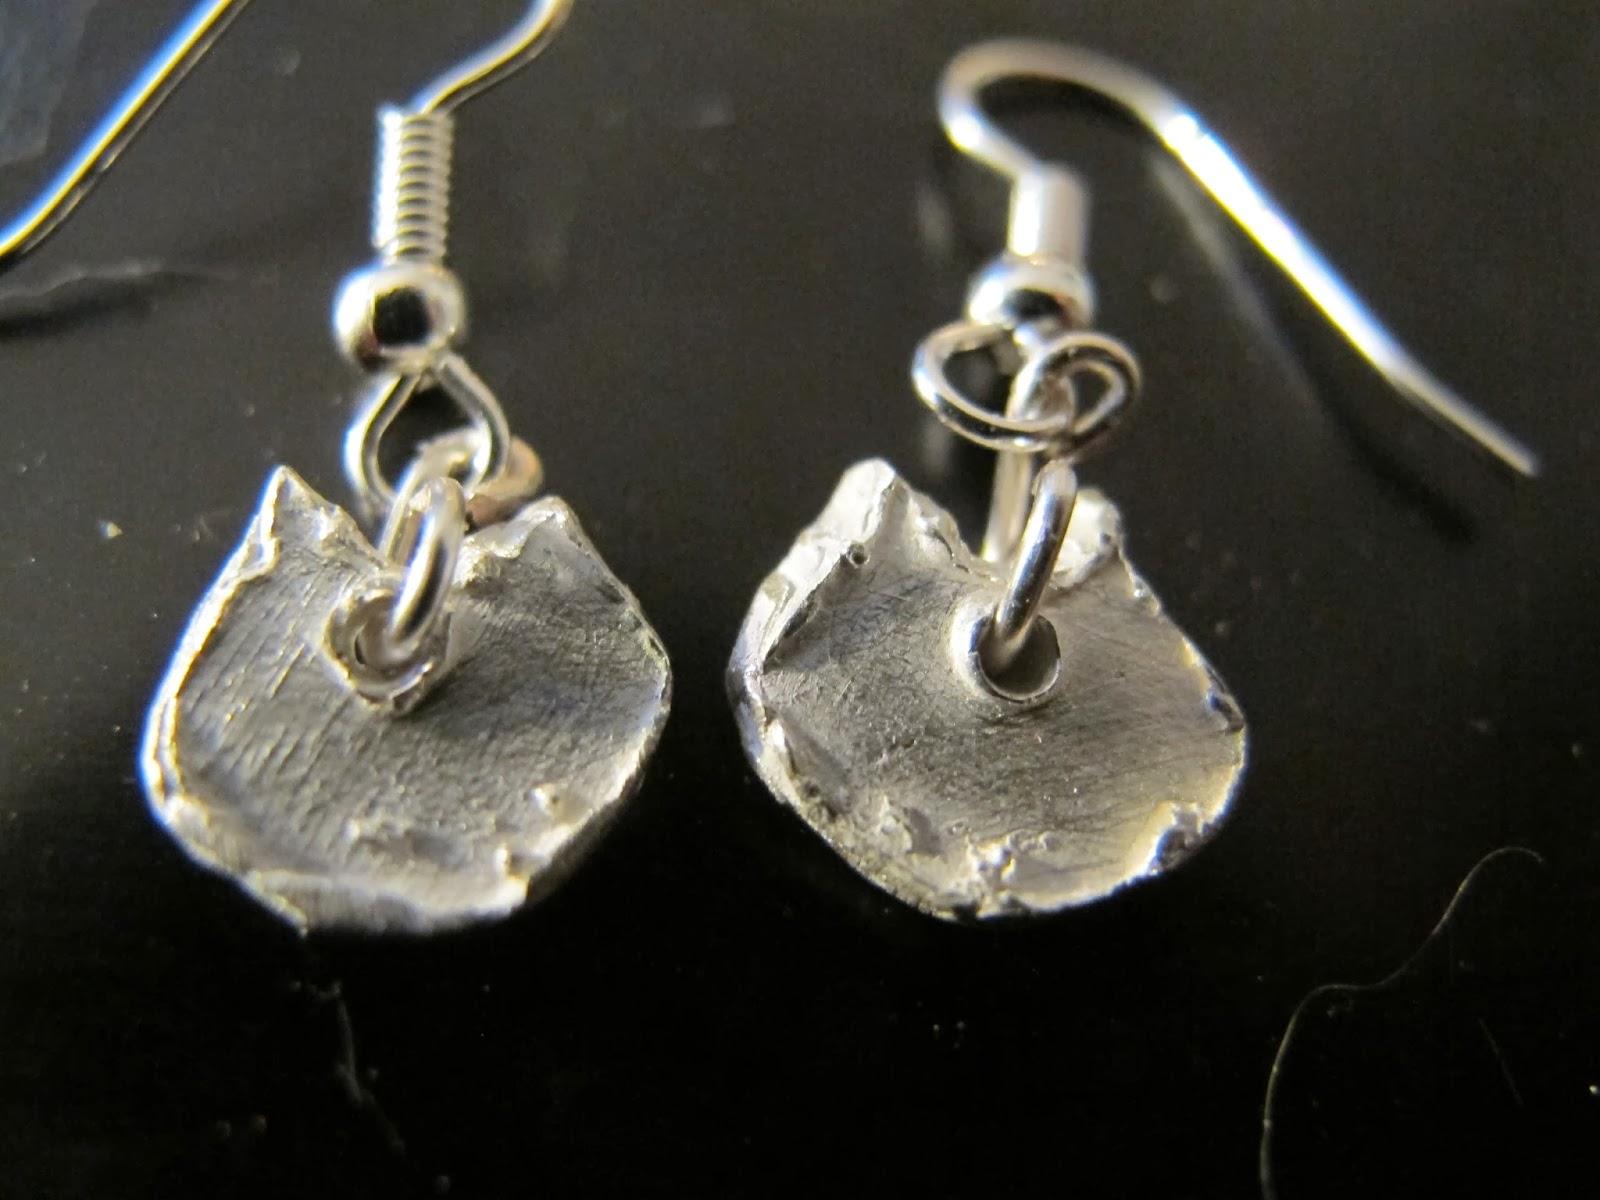 Metal Wire For Jewelry : Naomi s designs handmade wire jewelry meow photo